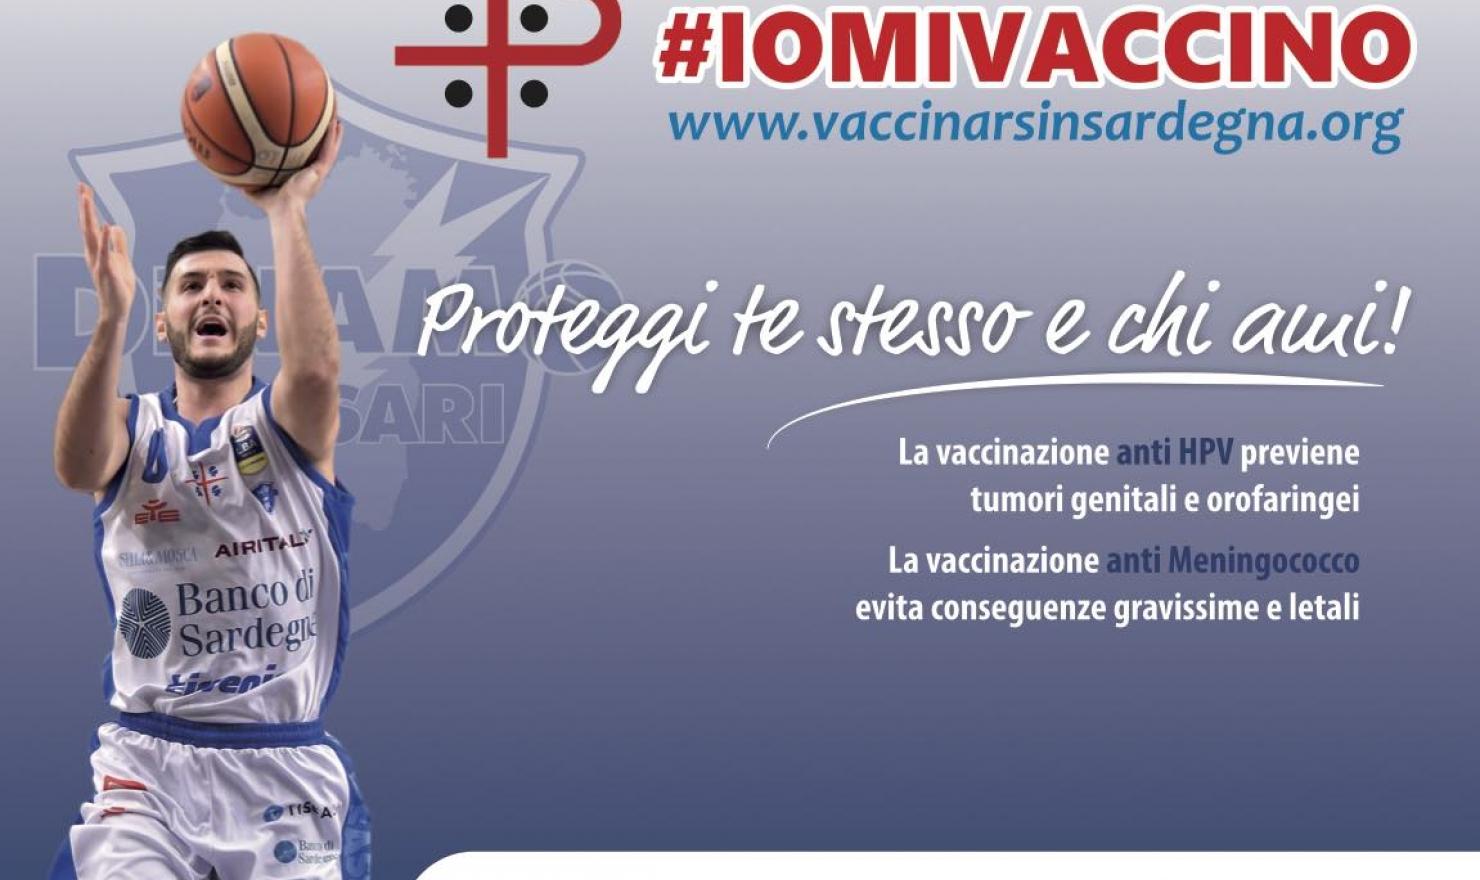 vaccino papilloma virus sardegna)